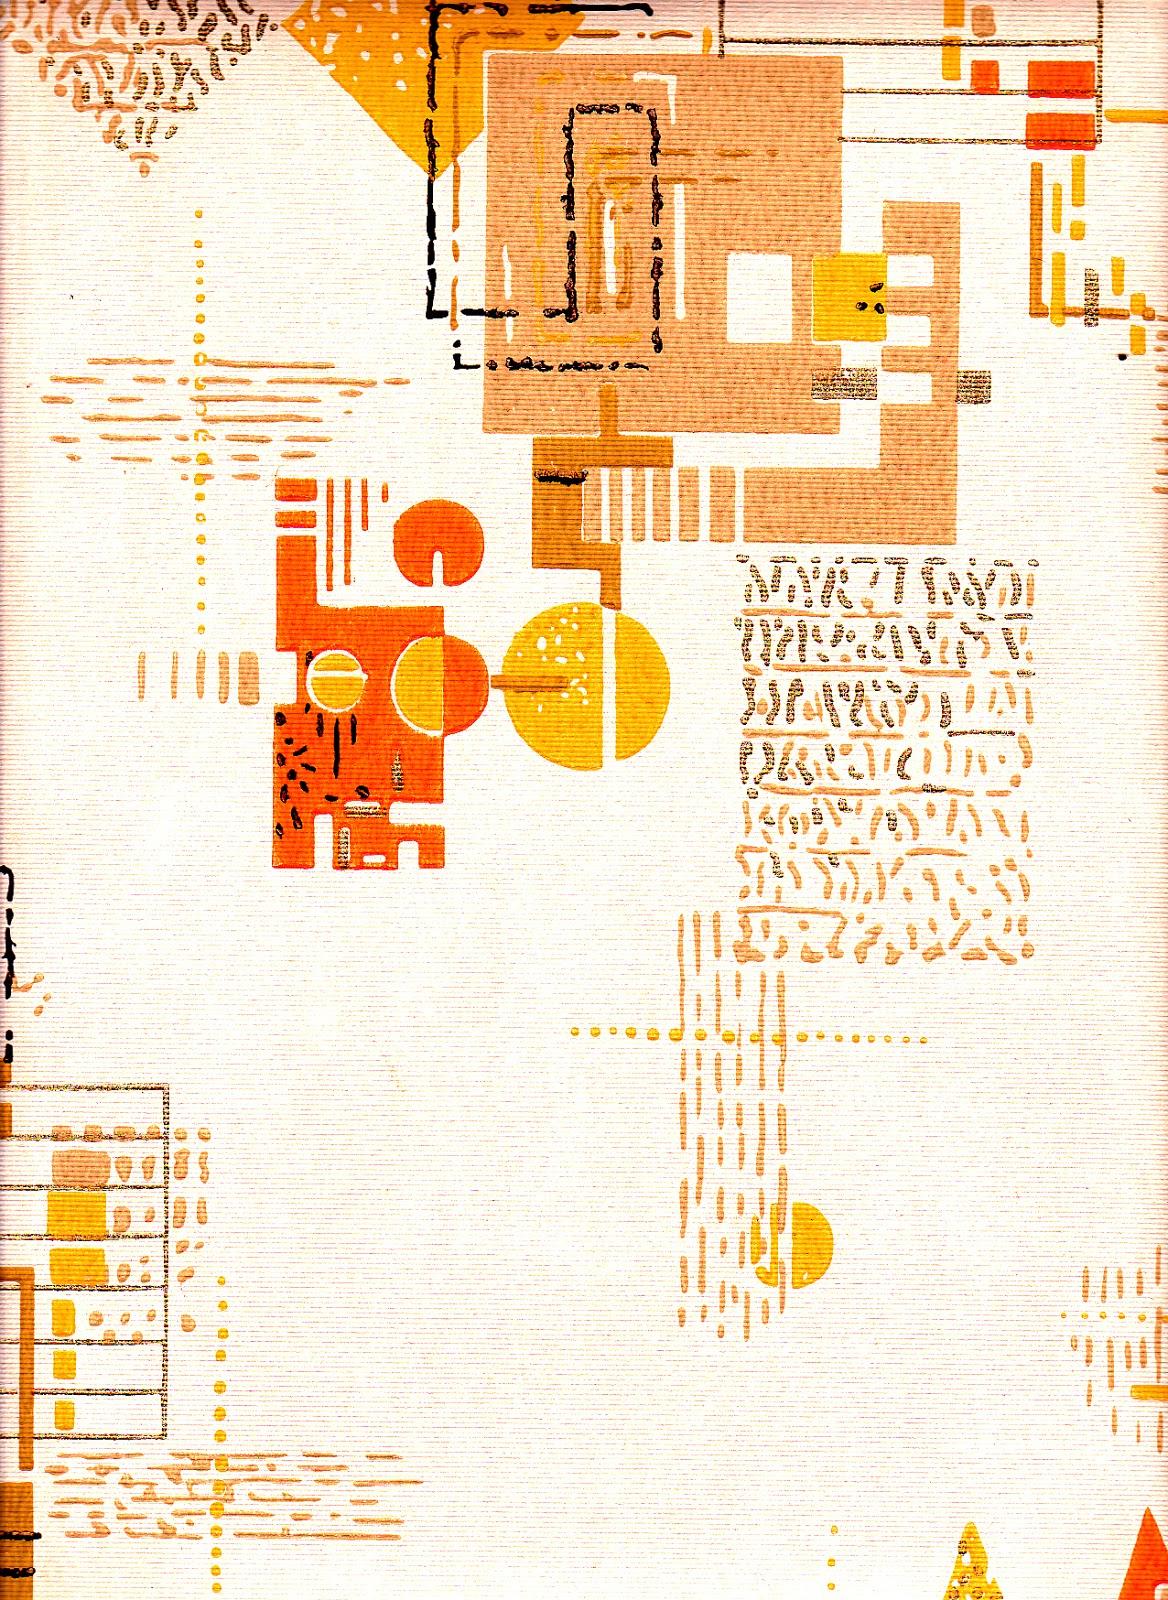 http://3.bp.blogspot.com/-fcwP1-TWqfs/UTjmvysUFAI/AAAAAAAAB4w/KTCo80p9lwA/s1600/more+vintage+wallpaper_0006.jpg